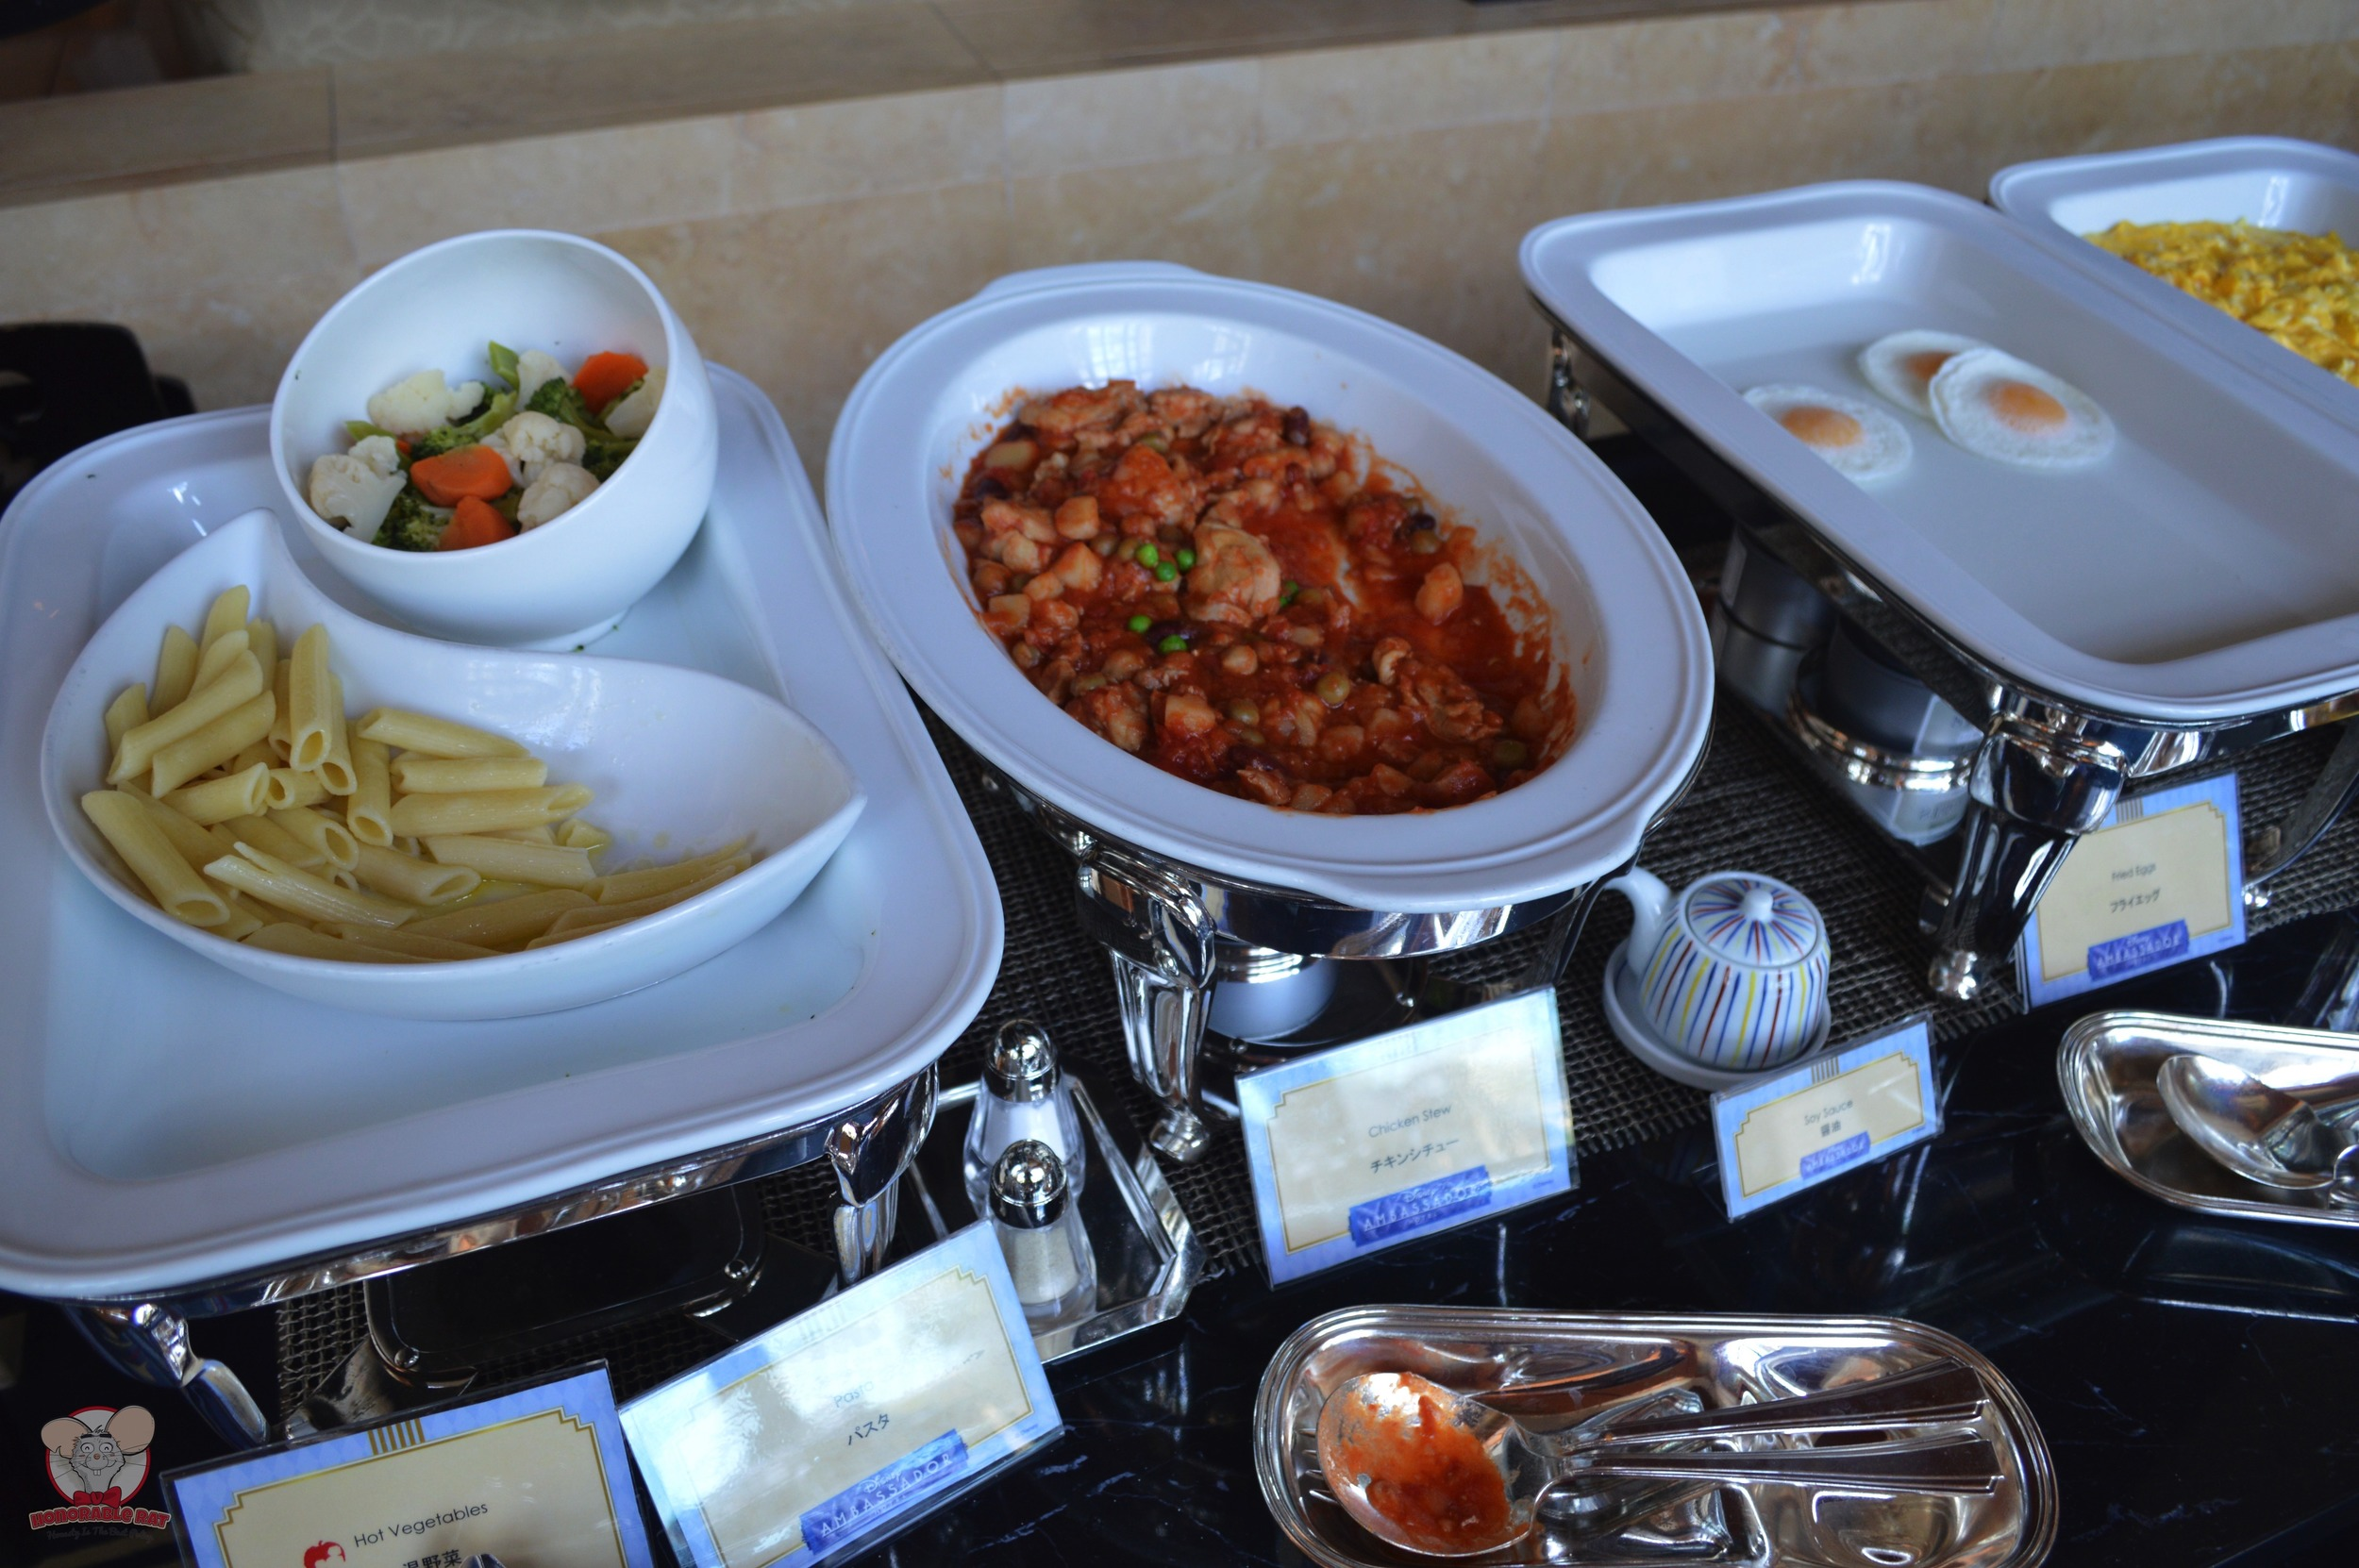 Vegetables, pasta, chicken stew and egg